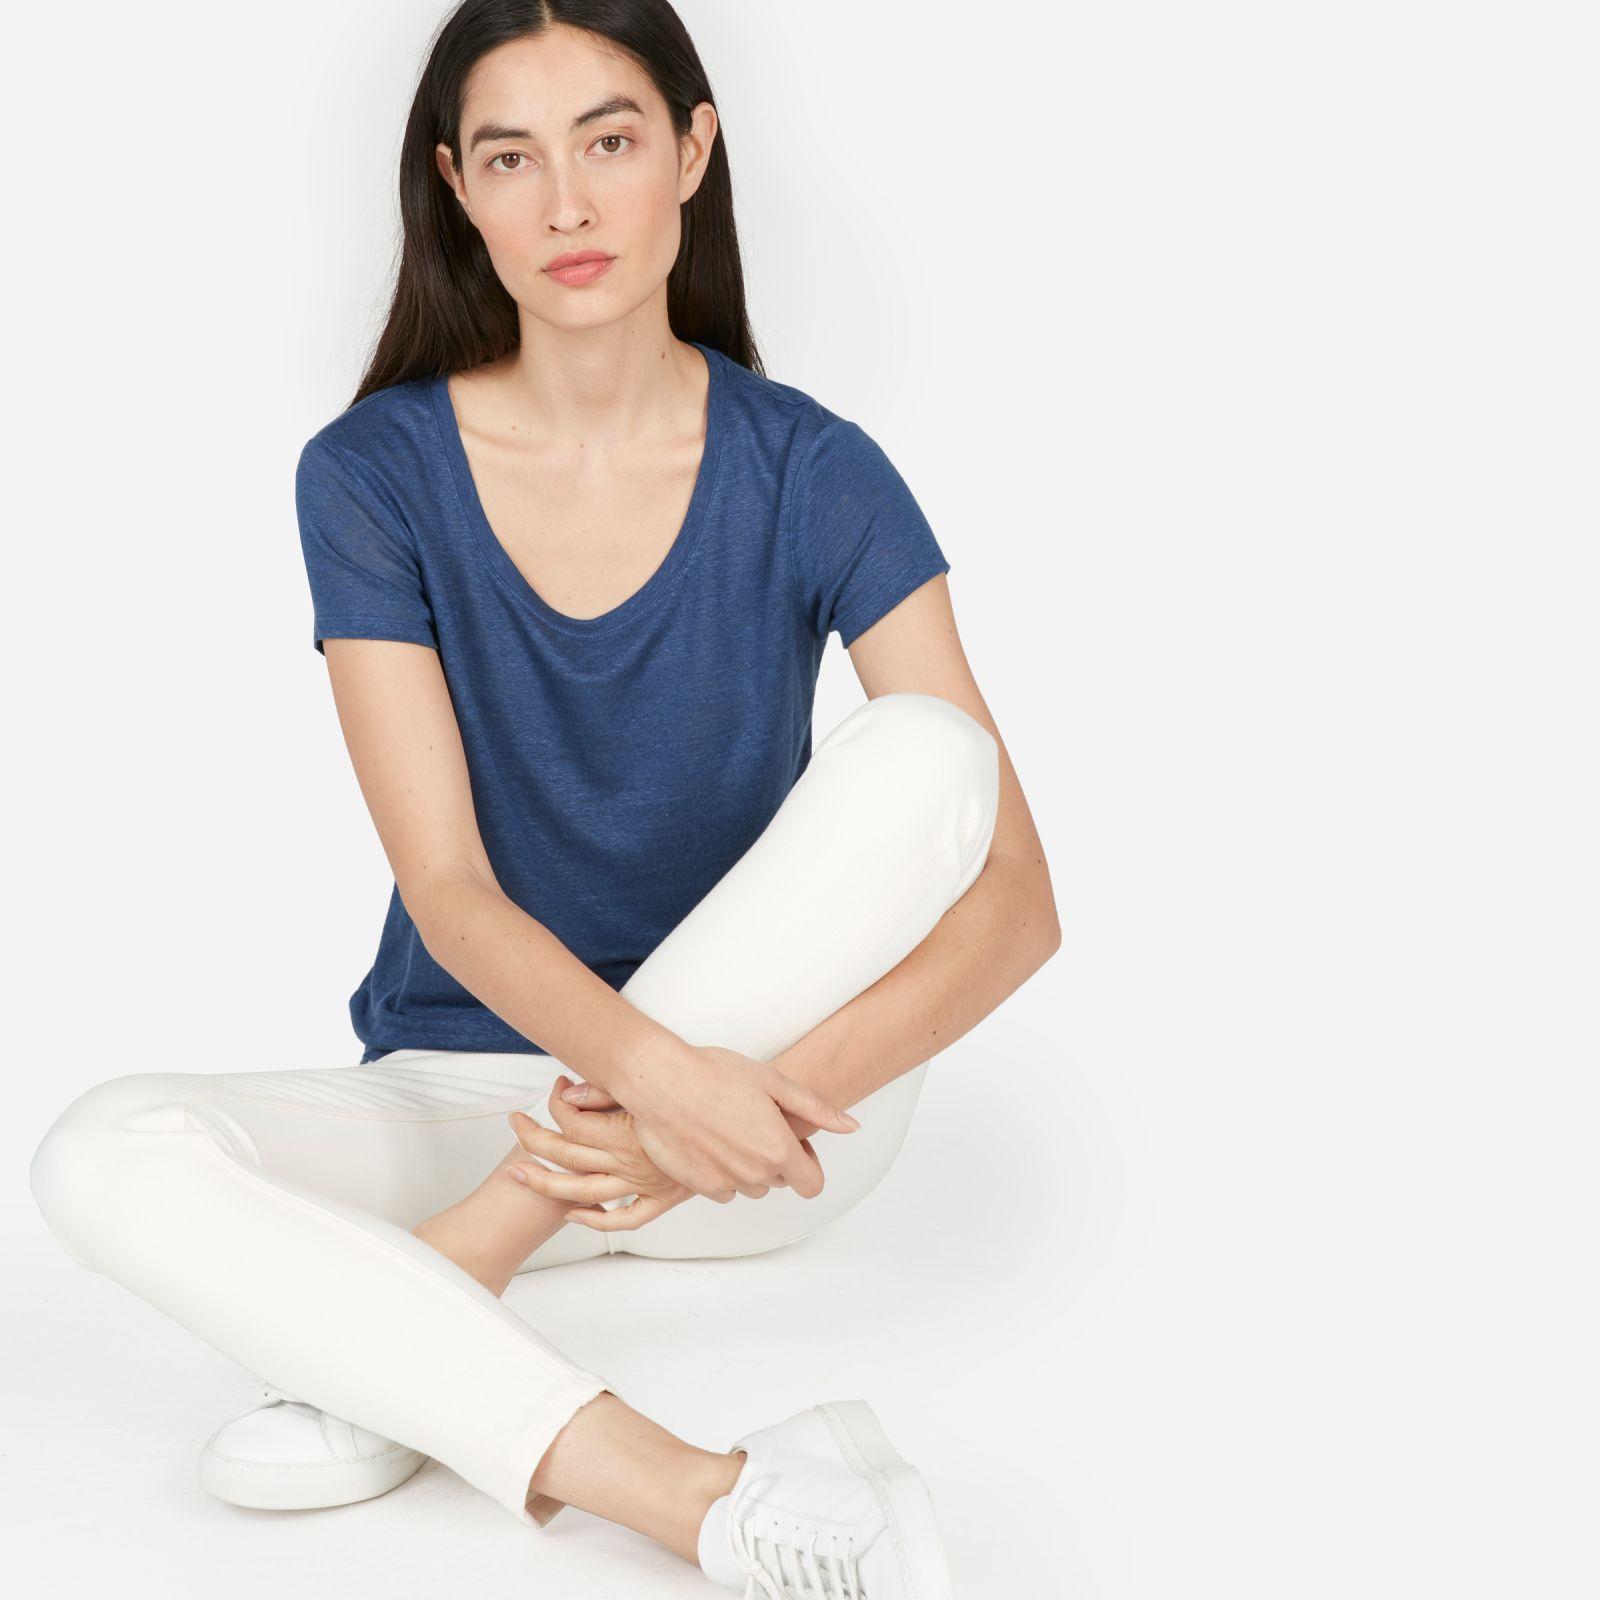 women's linen scoop-neck t-shirt by everlane in medium indigo, size s